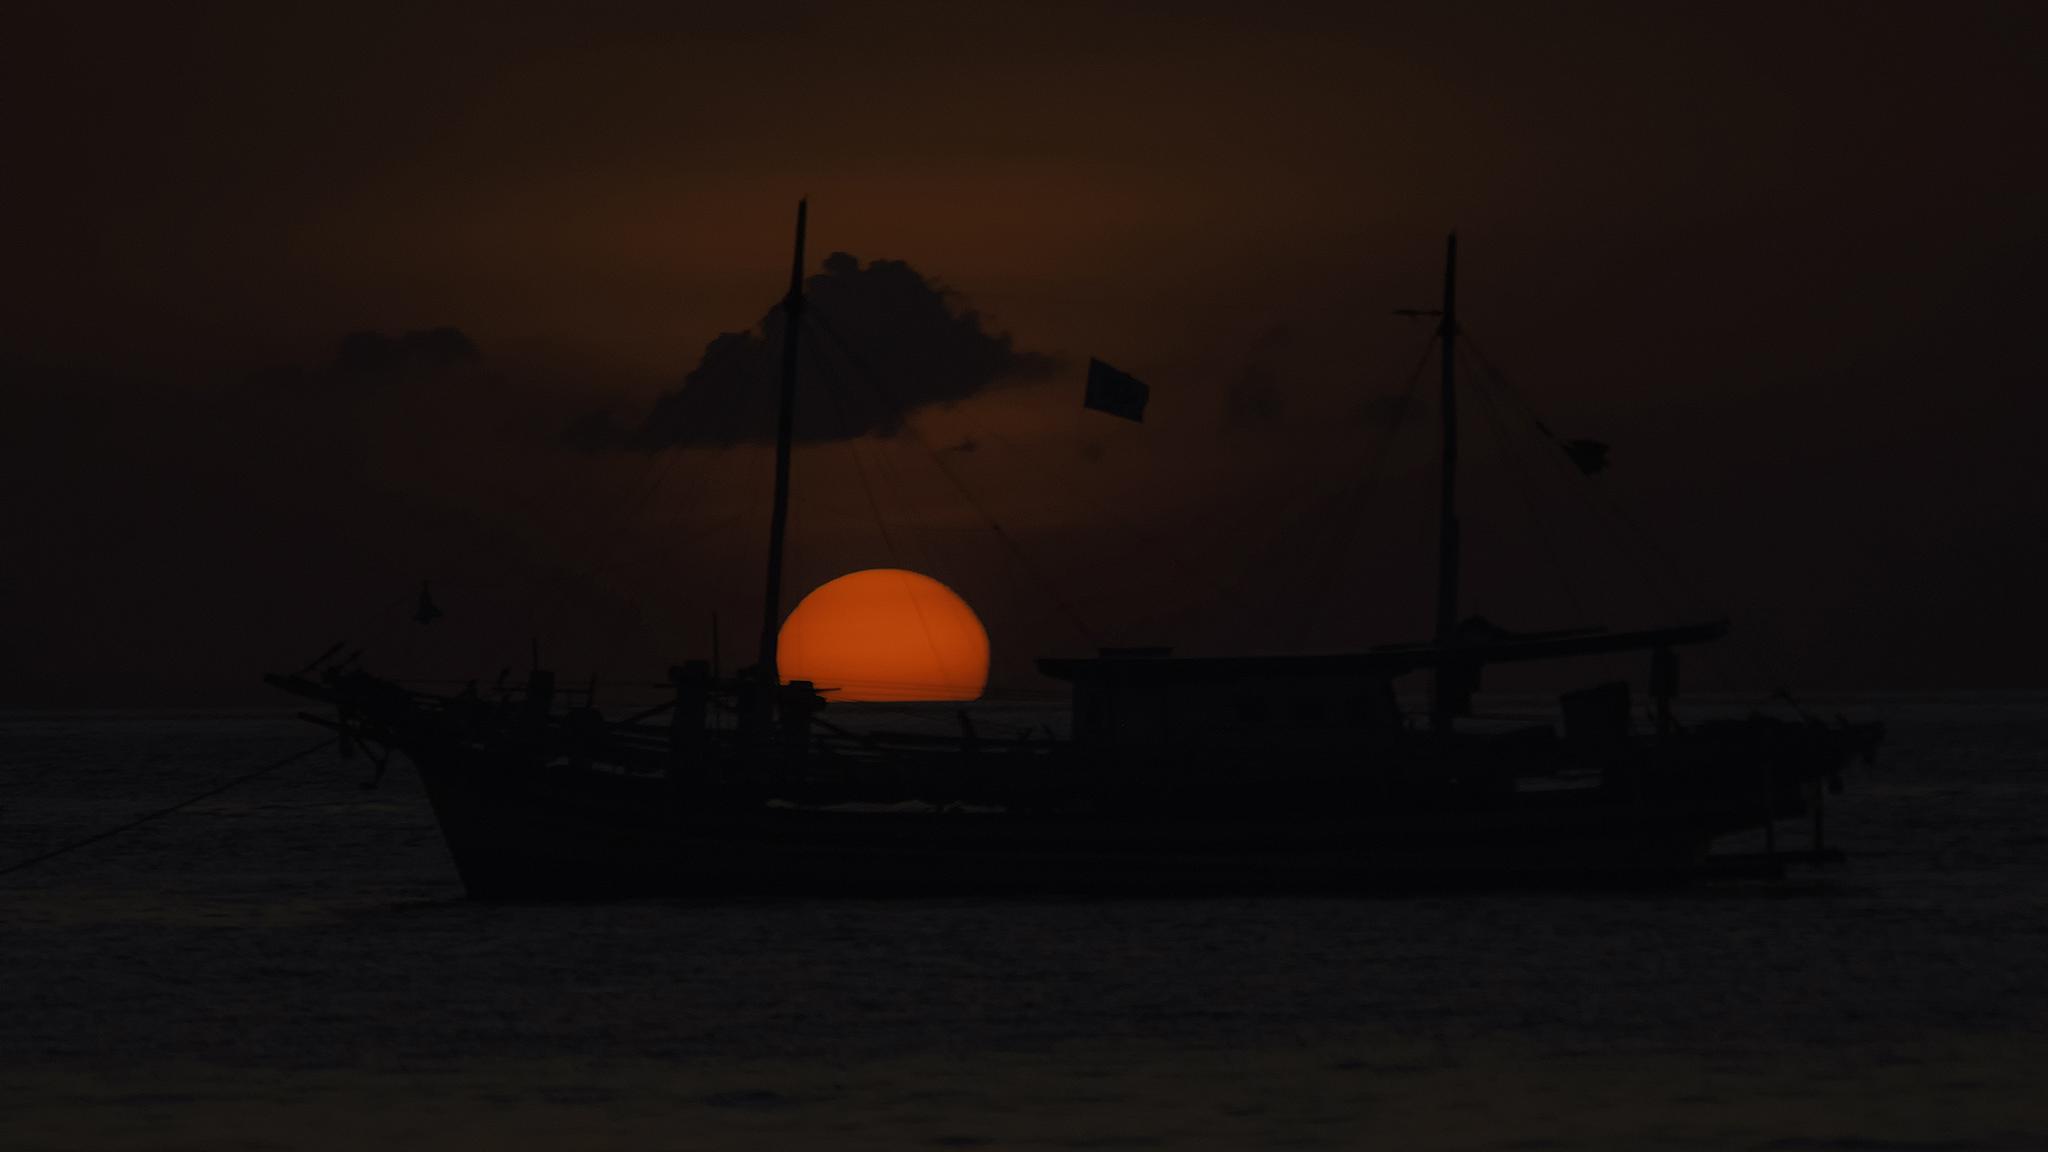 Sunset #2 by ajarsetiadi